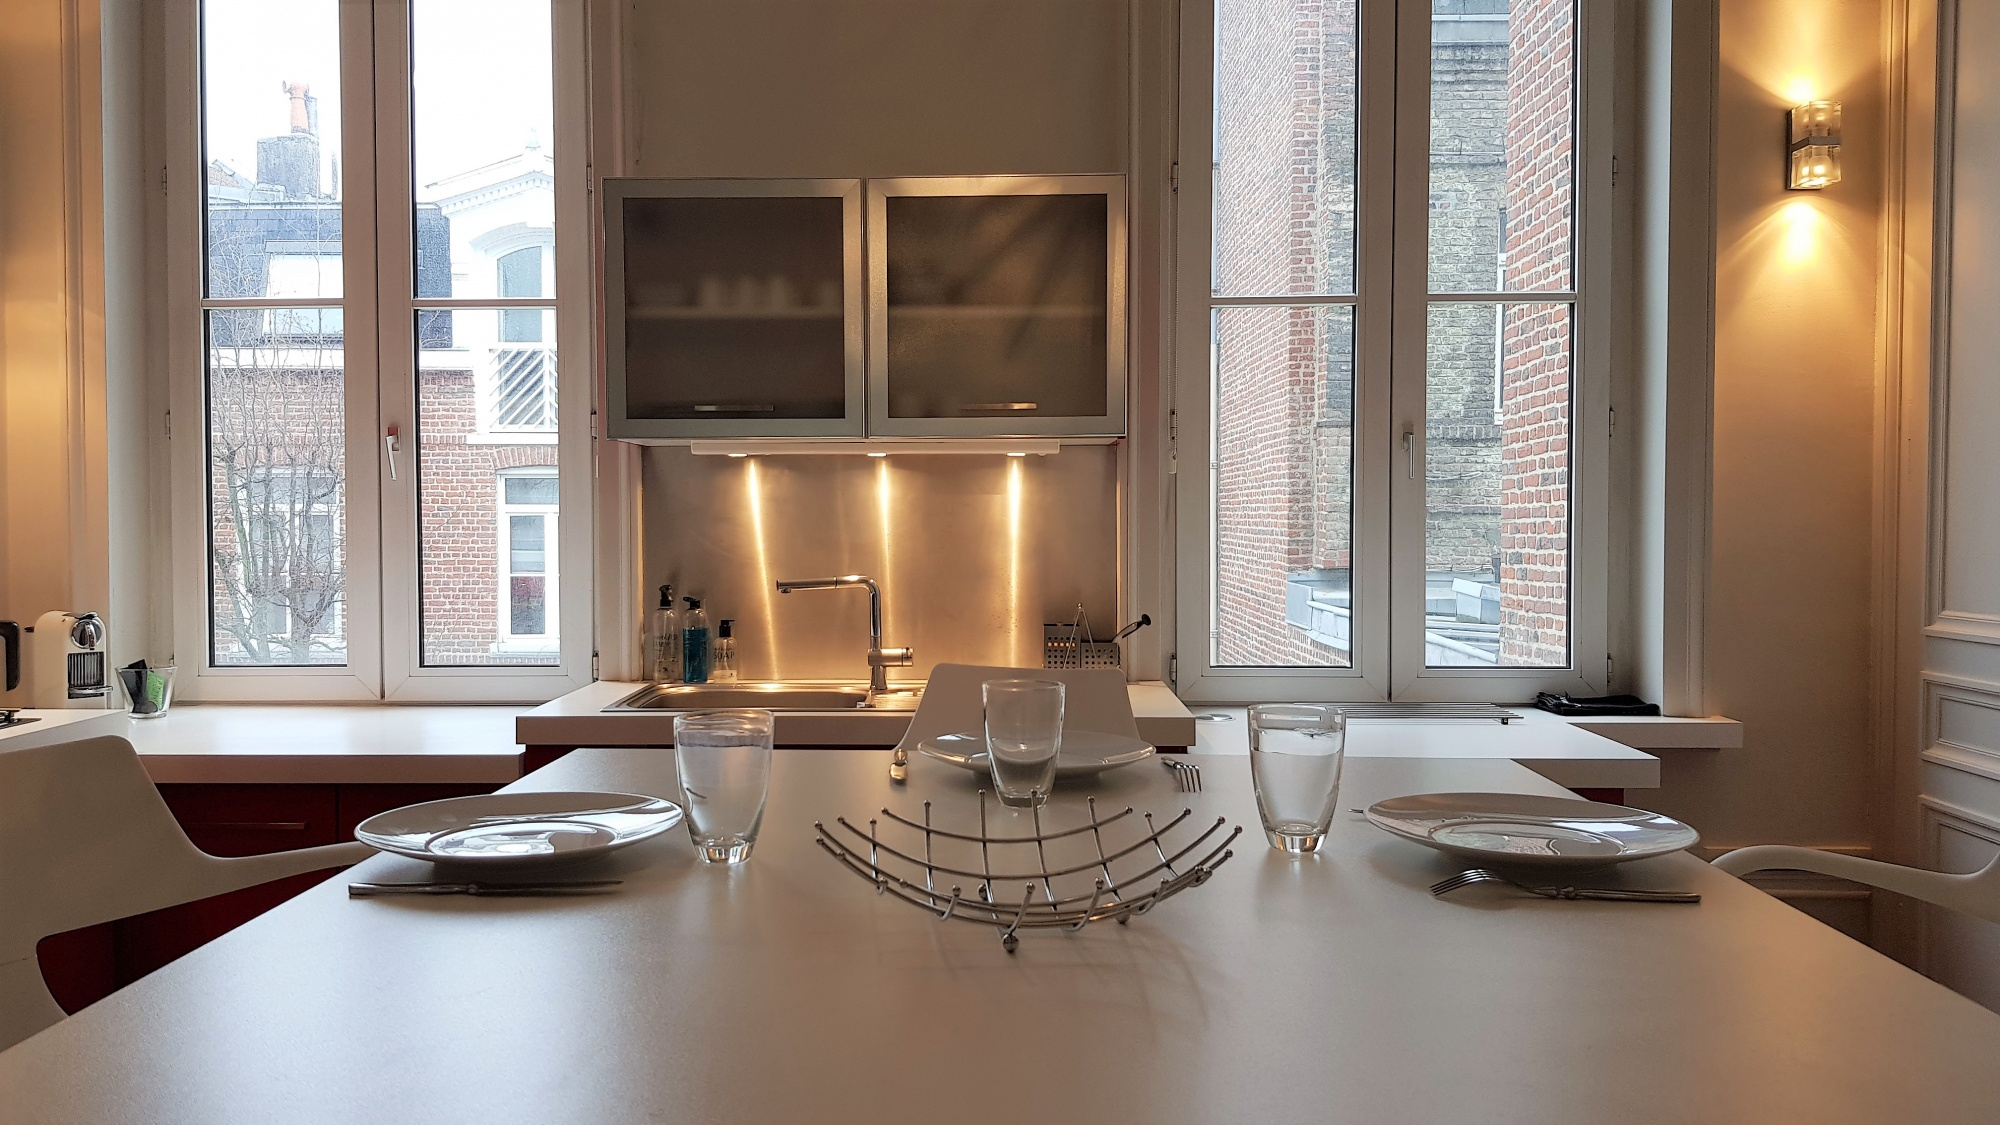 appart hotel appart h tel lille elise in meta ville. Black Bedroom Furniture Sets. Home Design Ideas